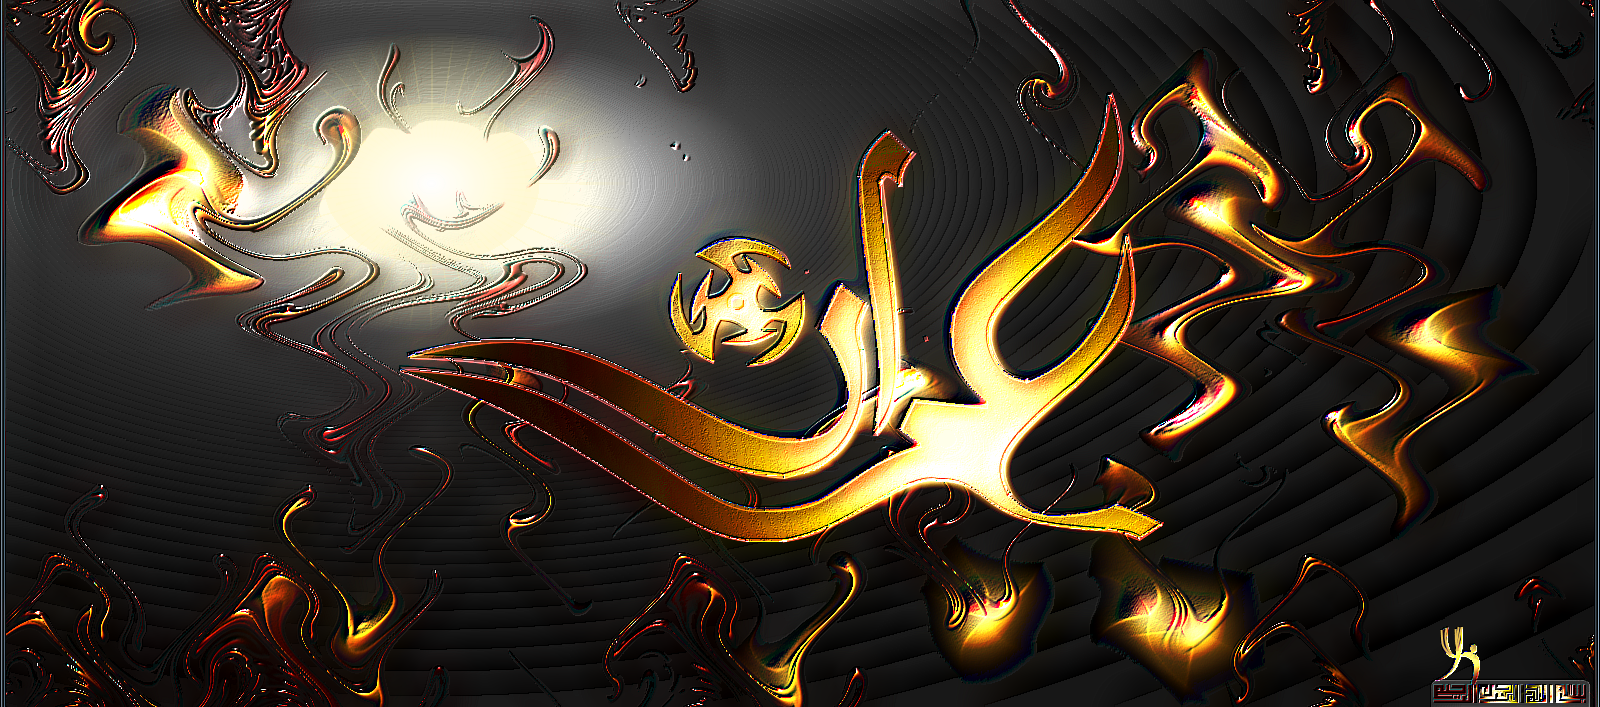 Wonderful Wallpaper Name Adil - a2ddab9b33e71e198c95a5efae675ac0  Image_543225.png